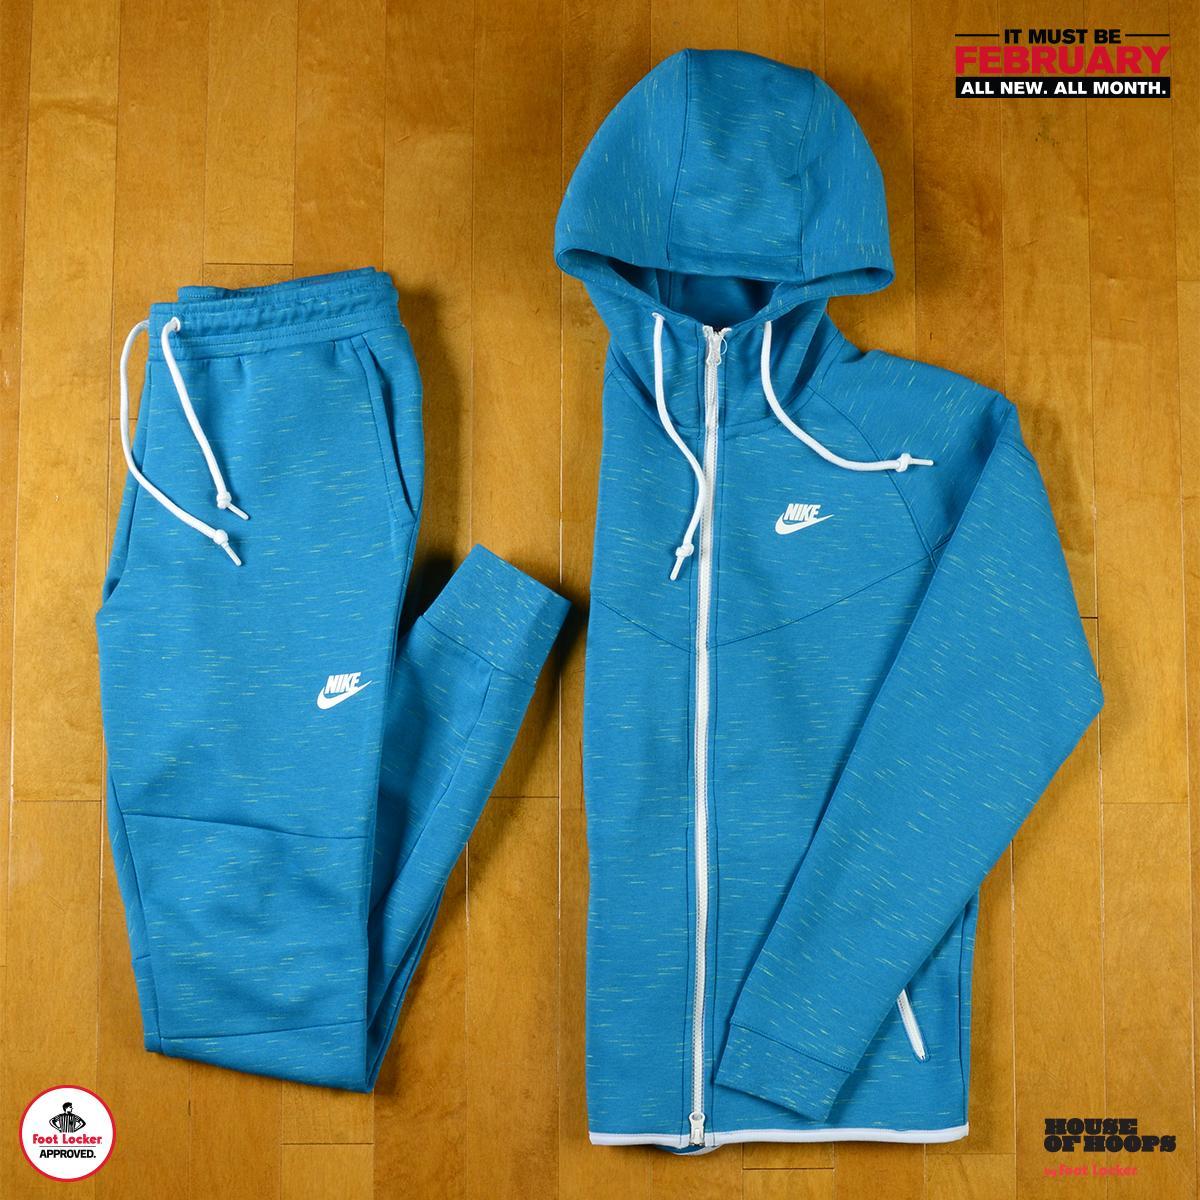 Foot Locker On Twitter Ultra Lightweight Fleece For Optimum Warmth The Light Blue Heather Nike Tech Fleece Hoodie Pant Available Now Http T Co 8ryzqcvguh